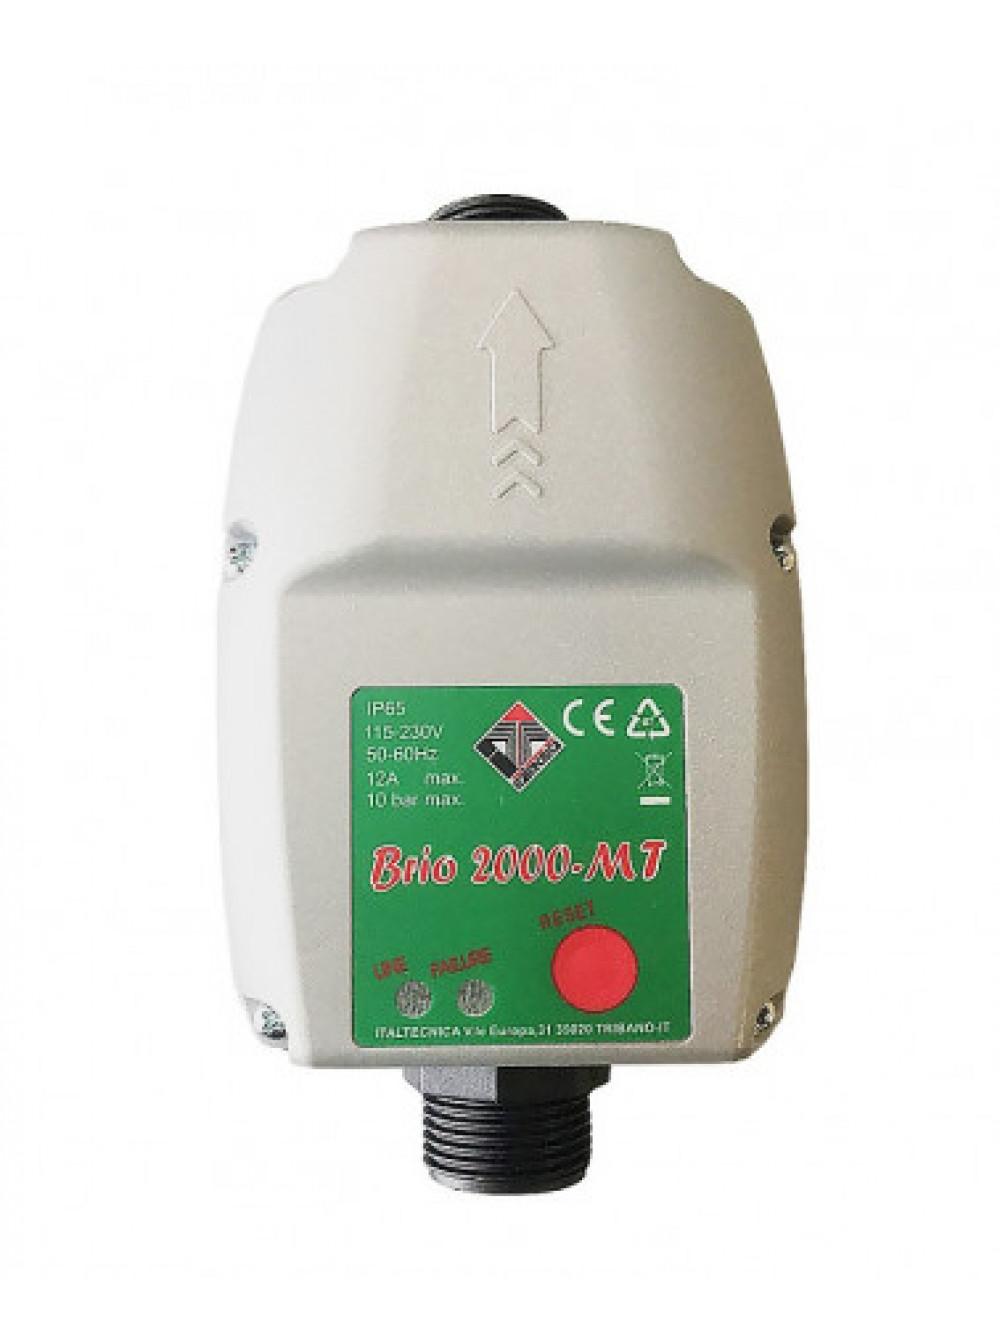 Электронное реле давления автоматика BRIO 2000-MT Italtecnica цена